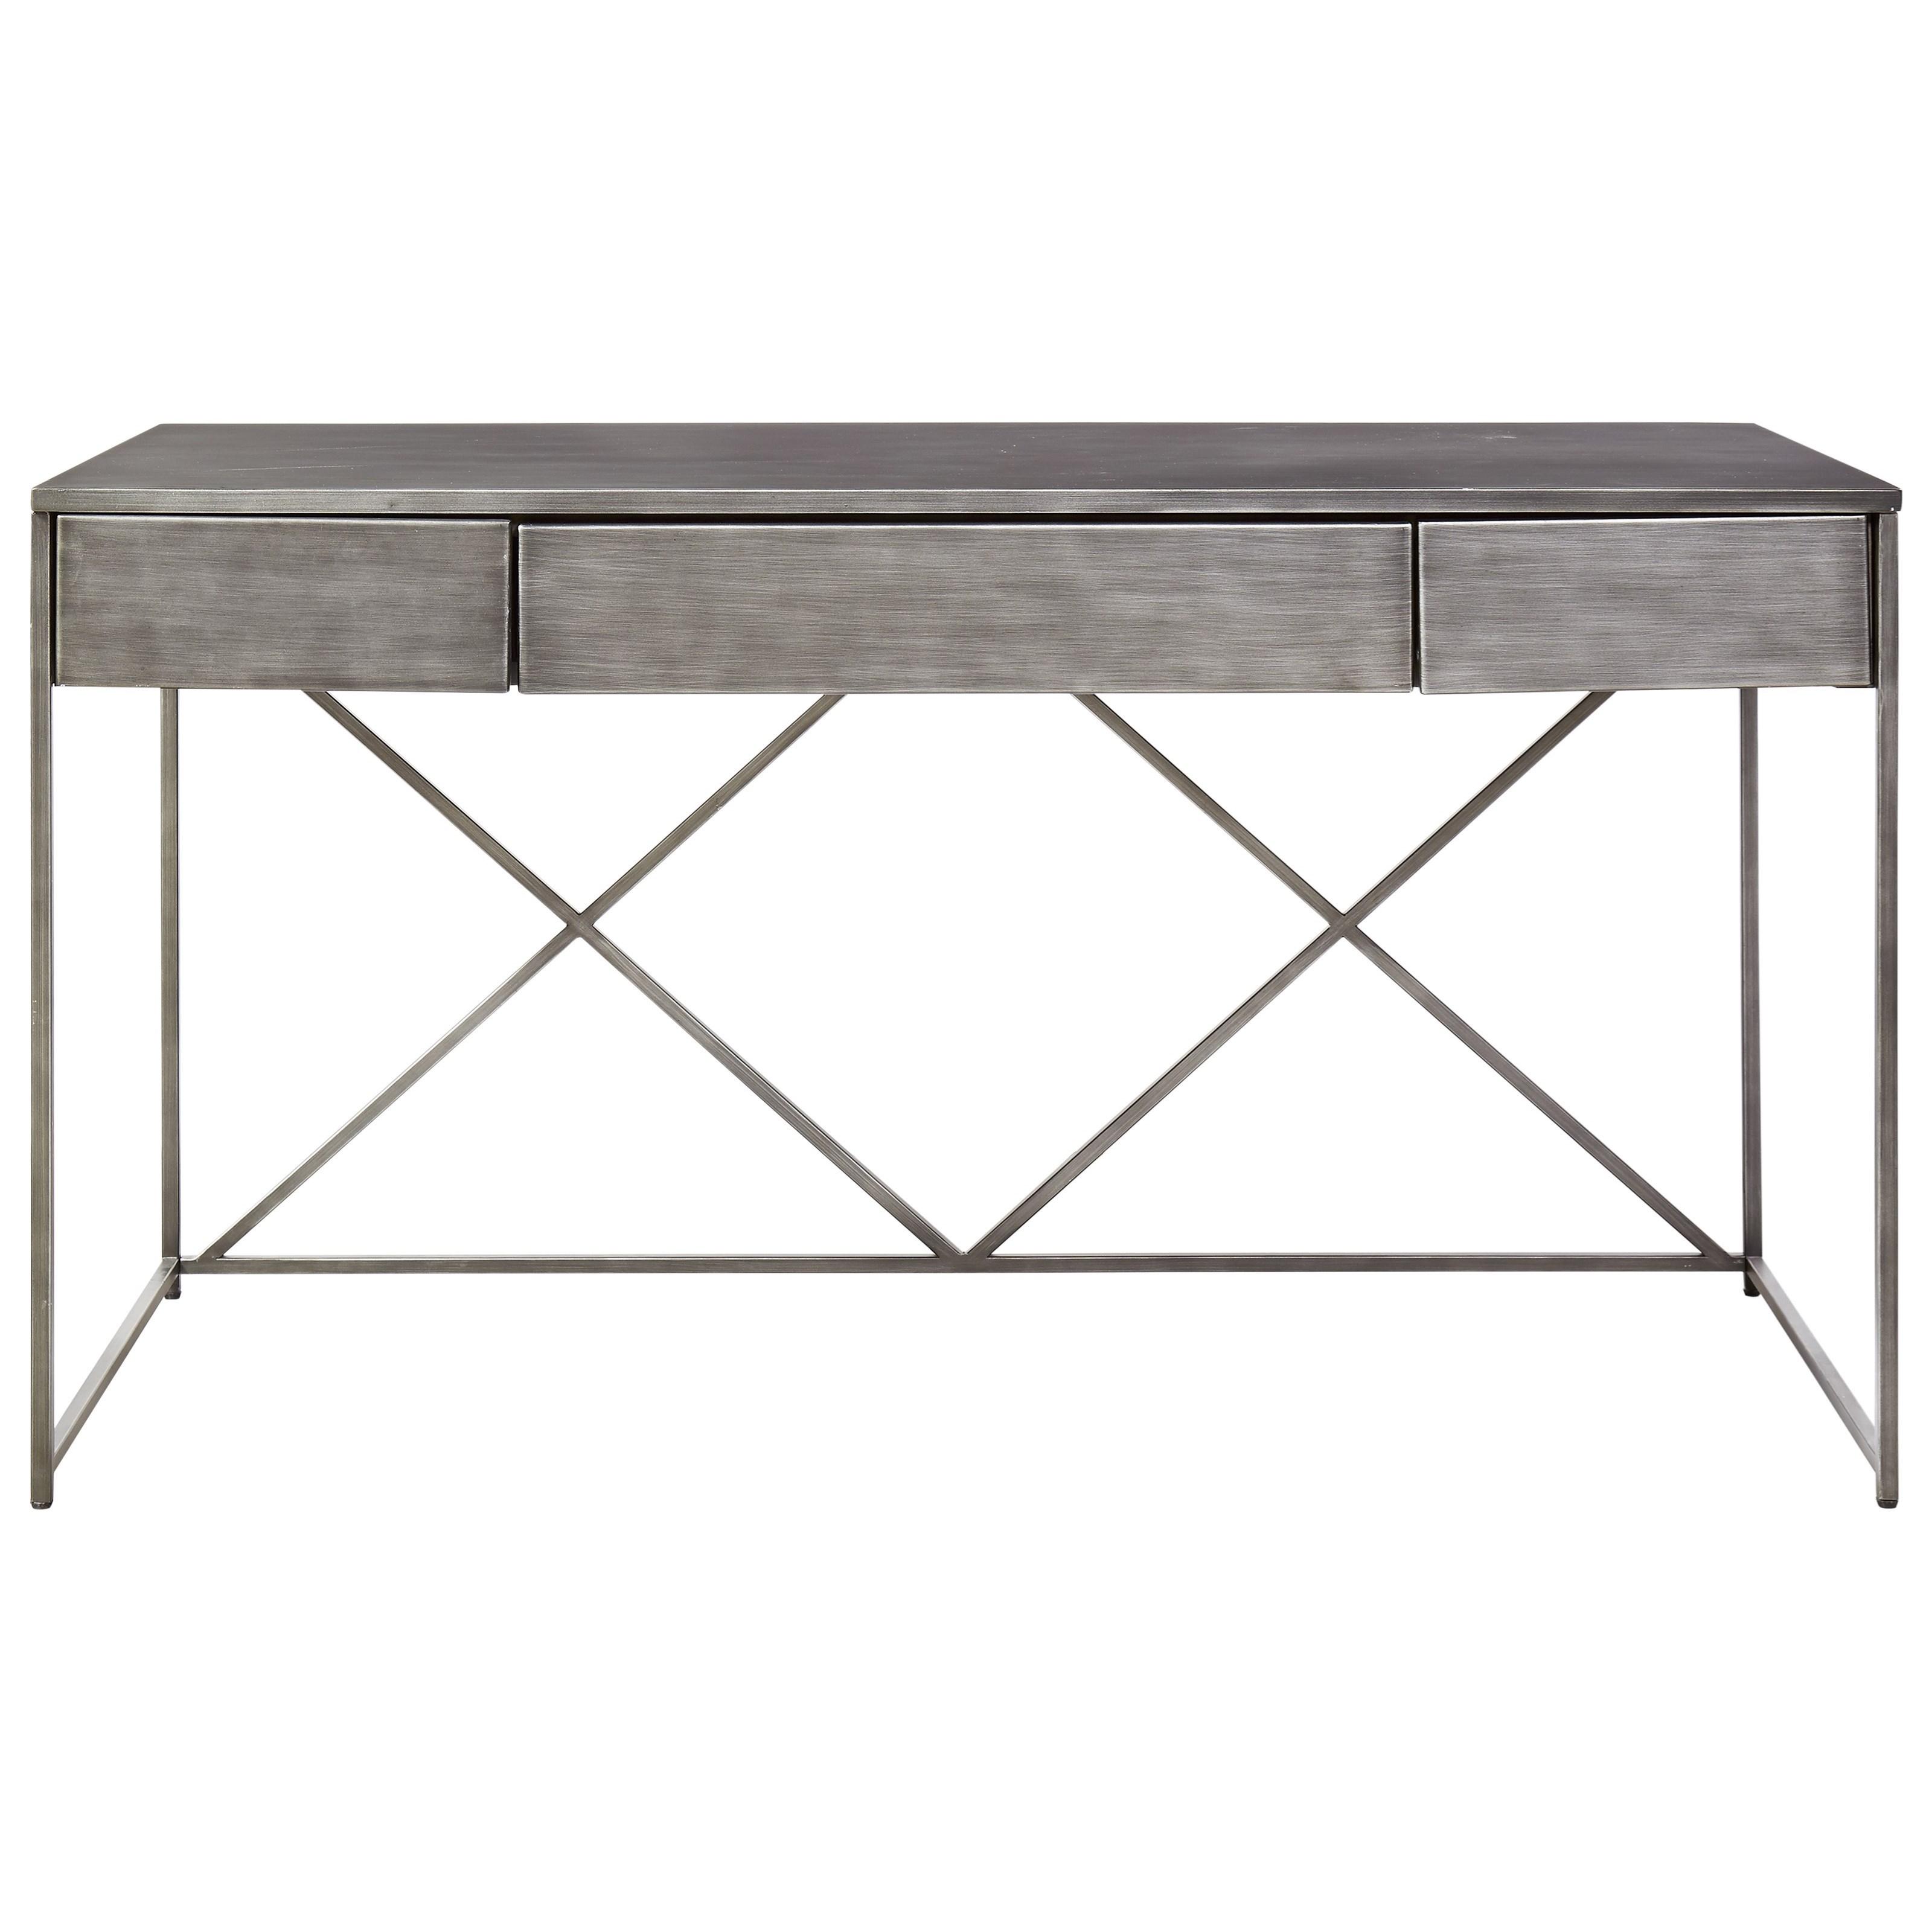 Universal Curated Pembroke Desk - Item Number: 558813